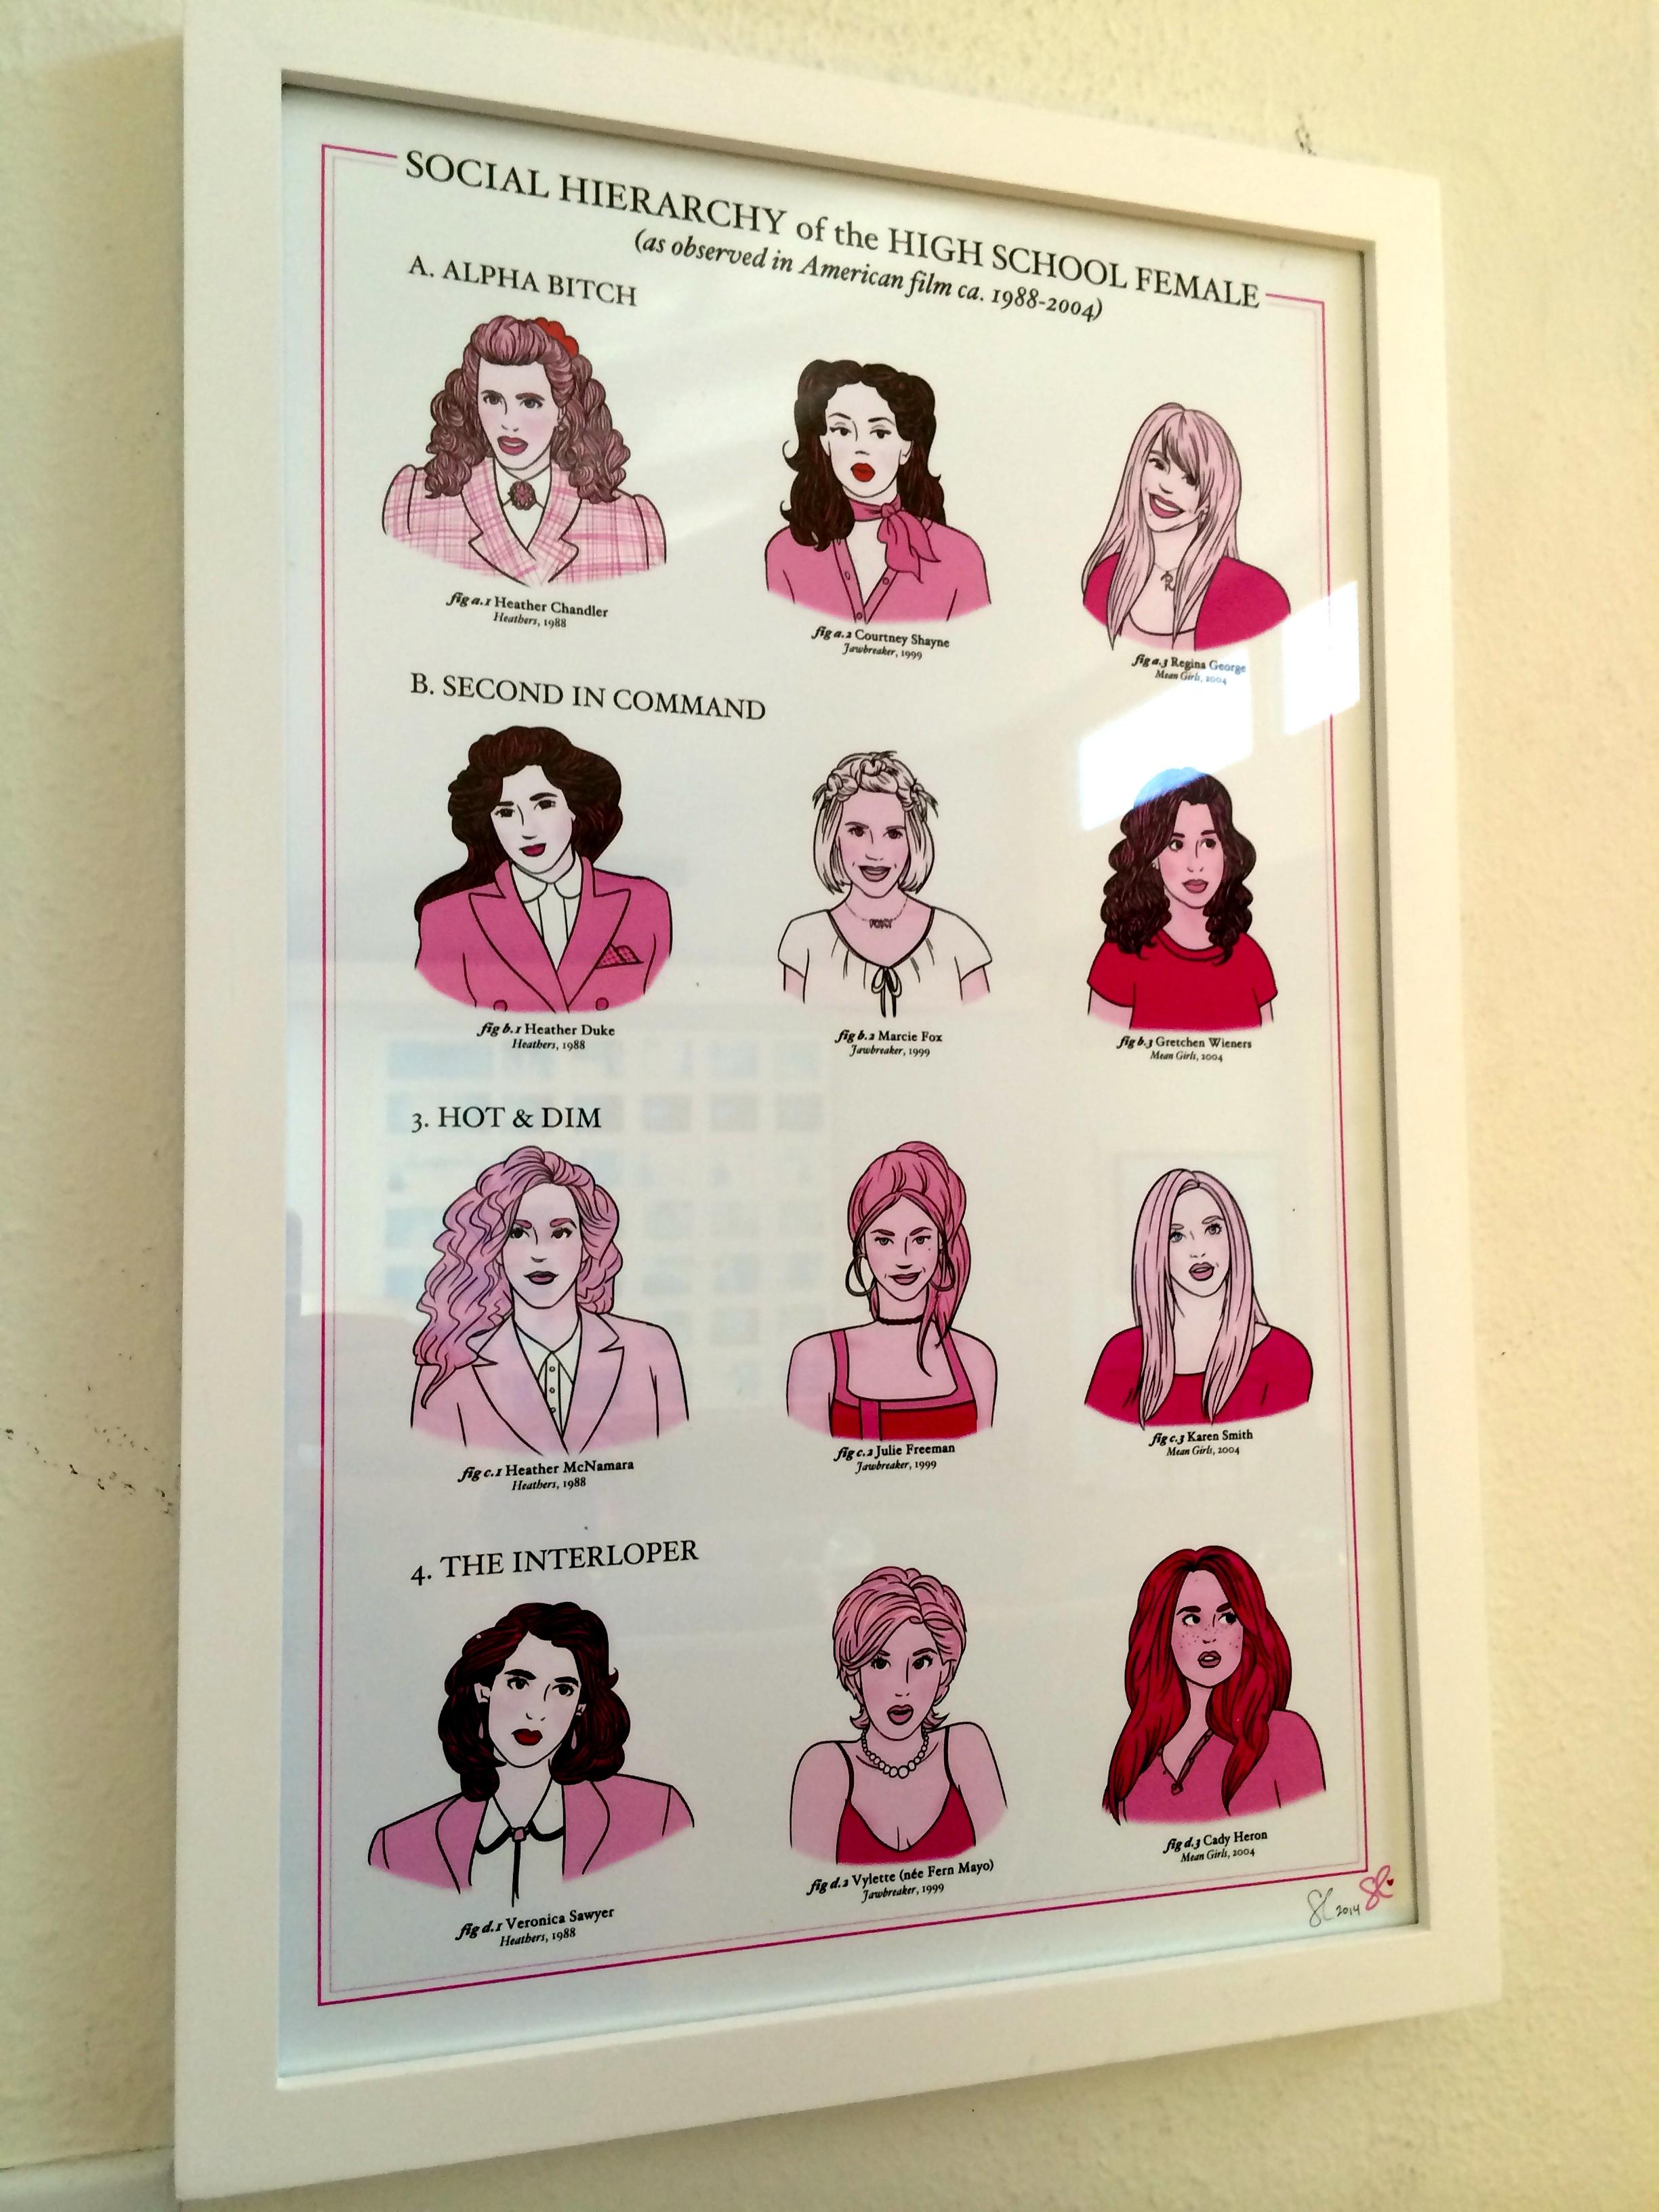 A piece of fan art Darren got celebrating the teen girl movies; Heathers, Jawbreaker and Mean Girls.